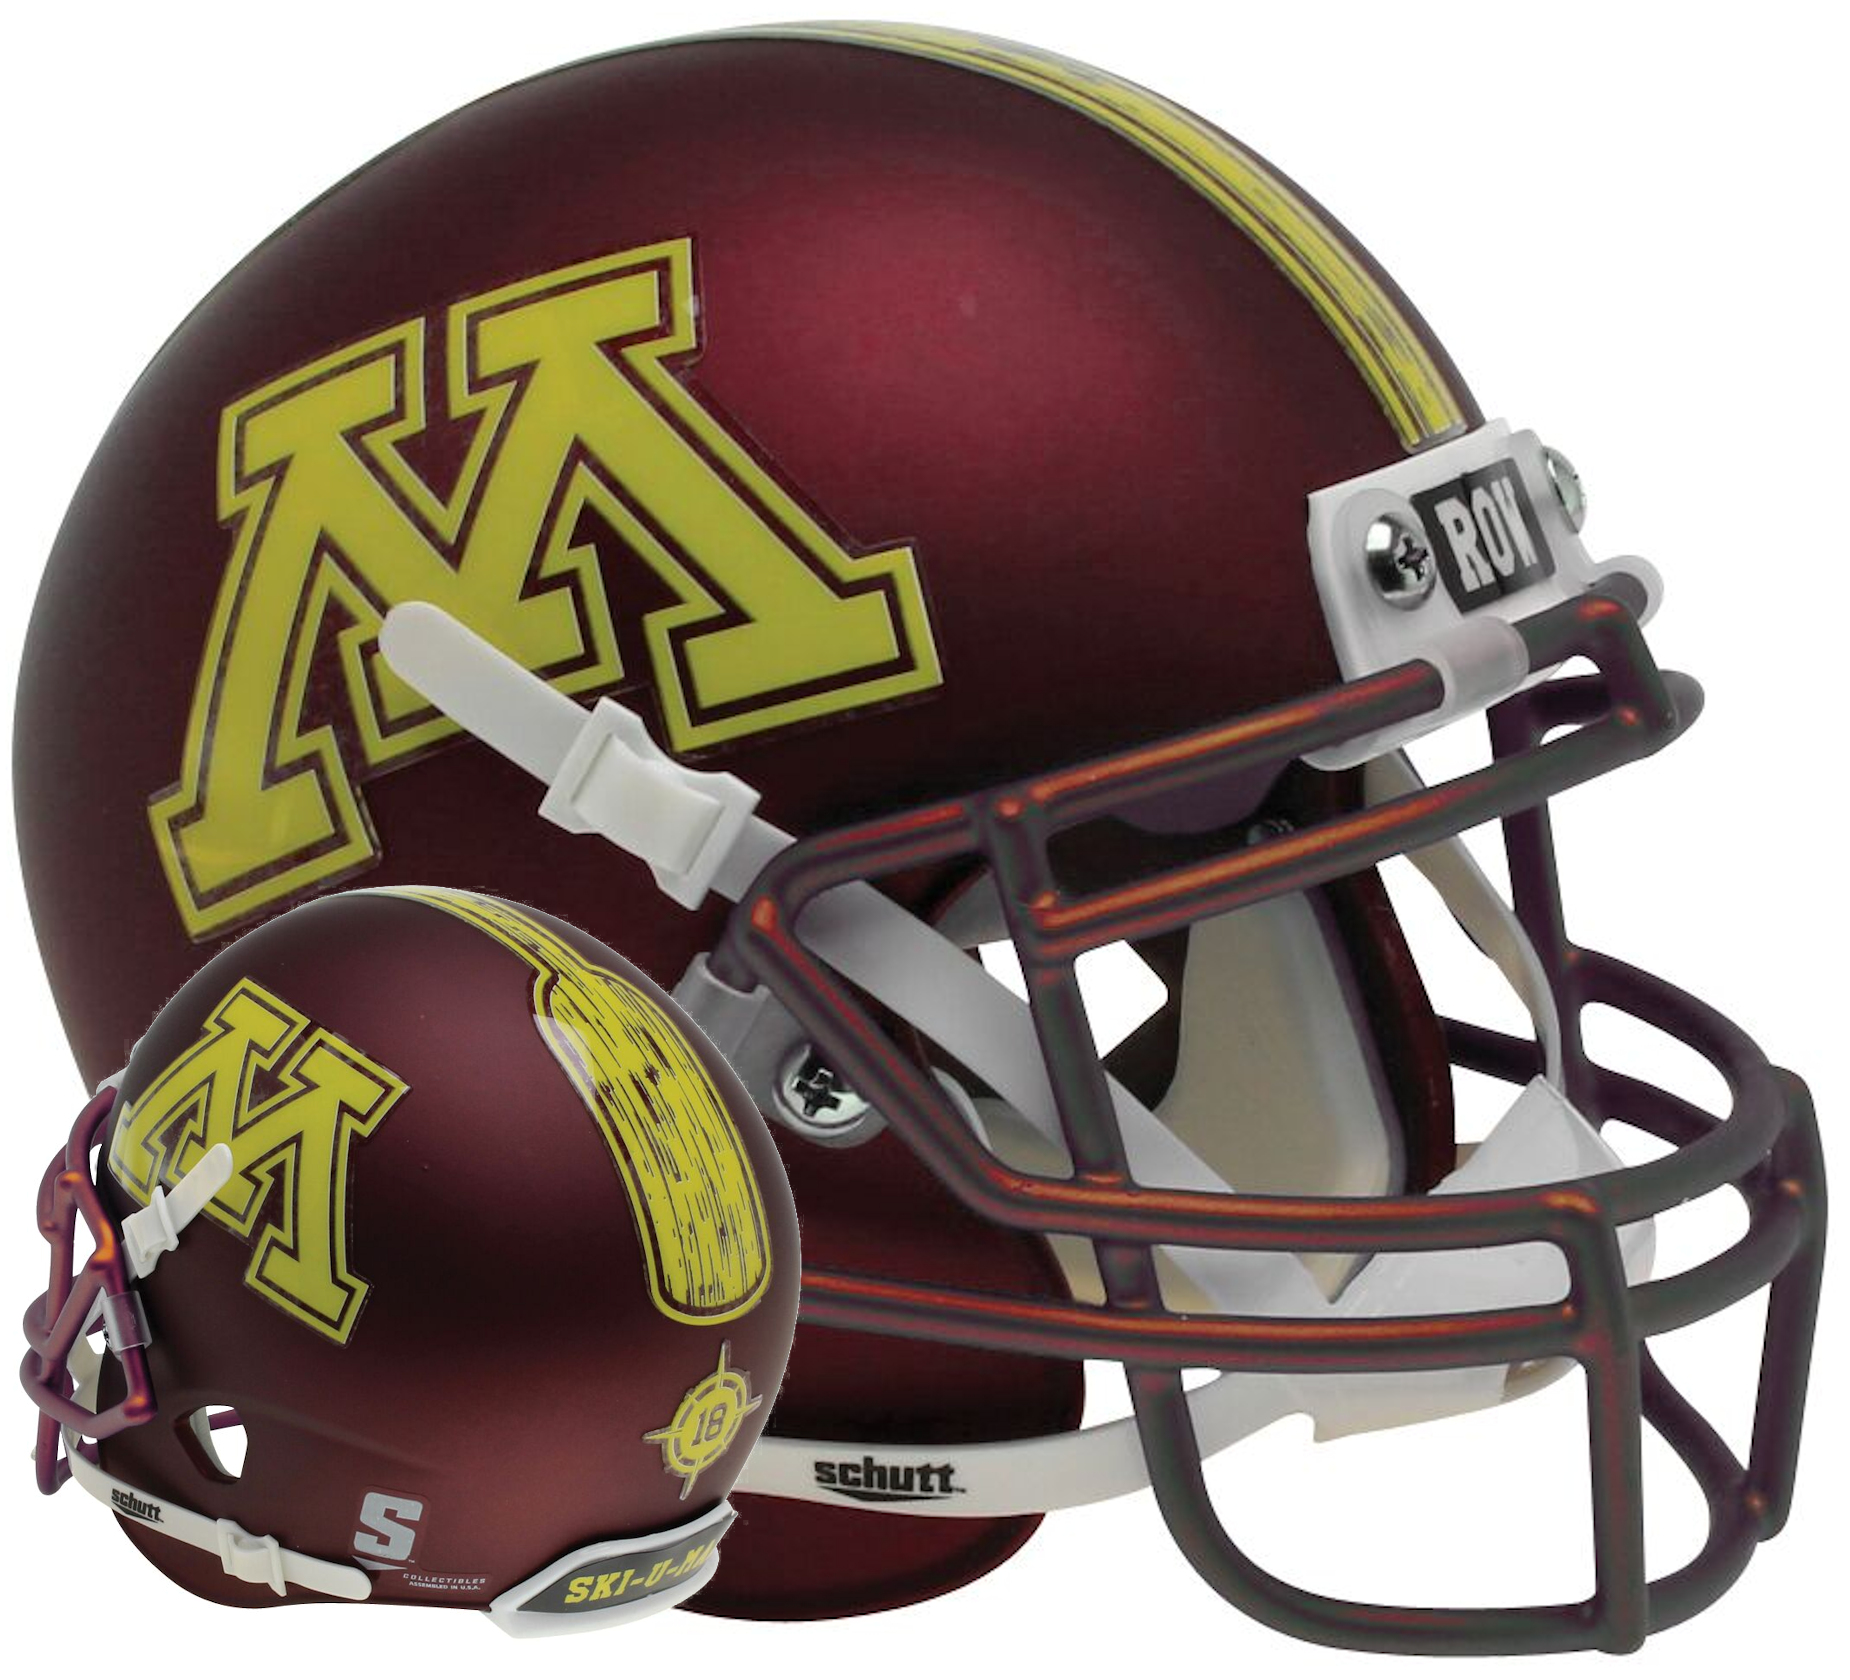 Minnesota Golden Gophers Authentic College XP Football Helmet Schutt <B>Satin Maroon</B>